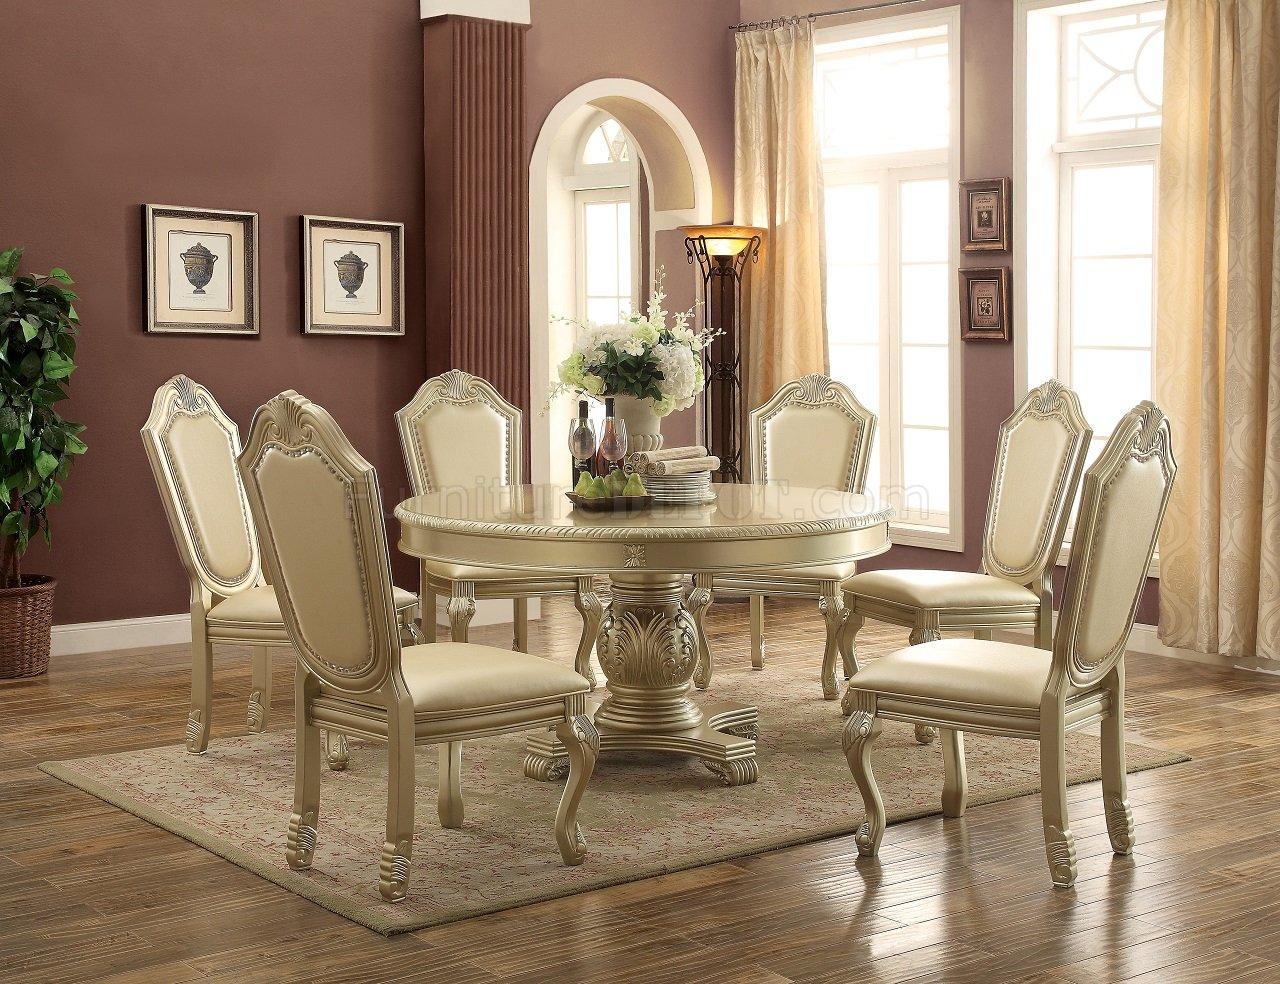 Chateau De Ville 64050 Dining Table By Acme WOptions